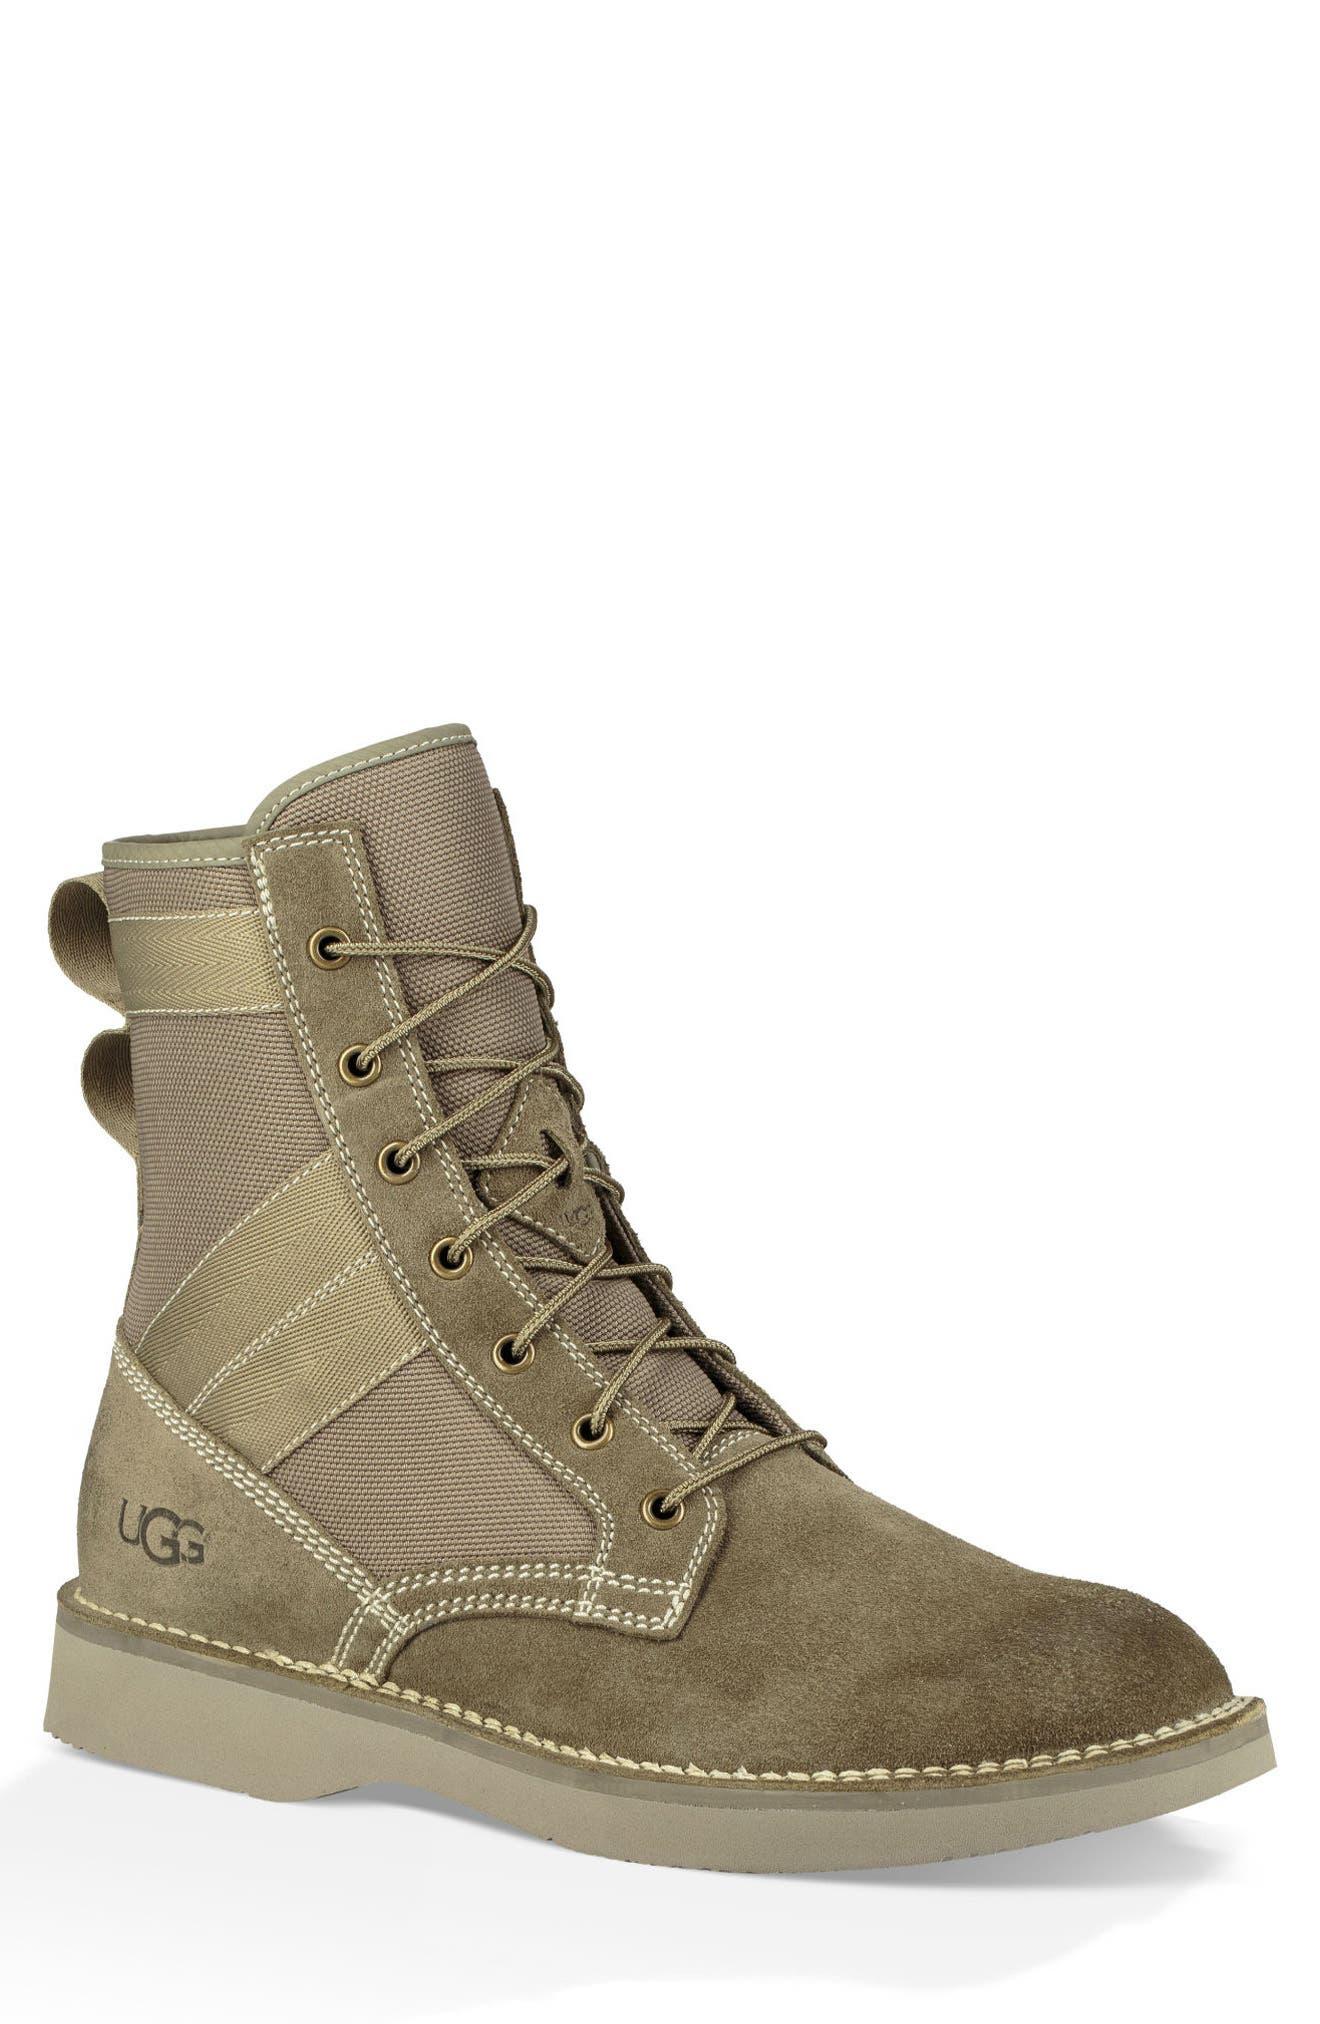 Ugg Camino Plain Toe Boot- Beige